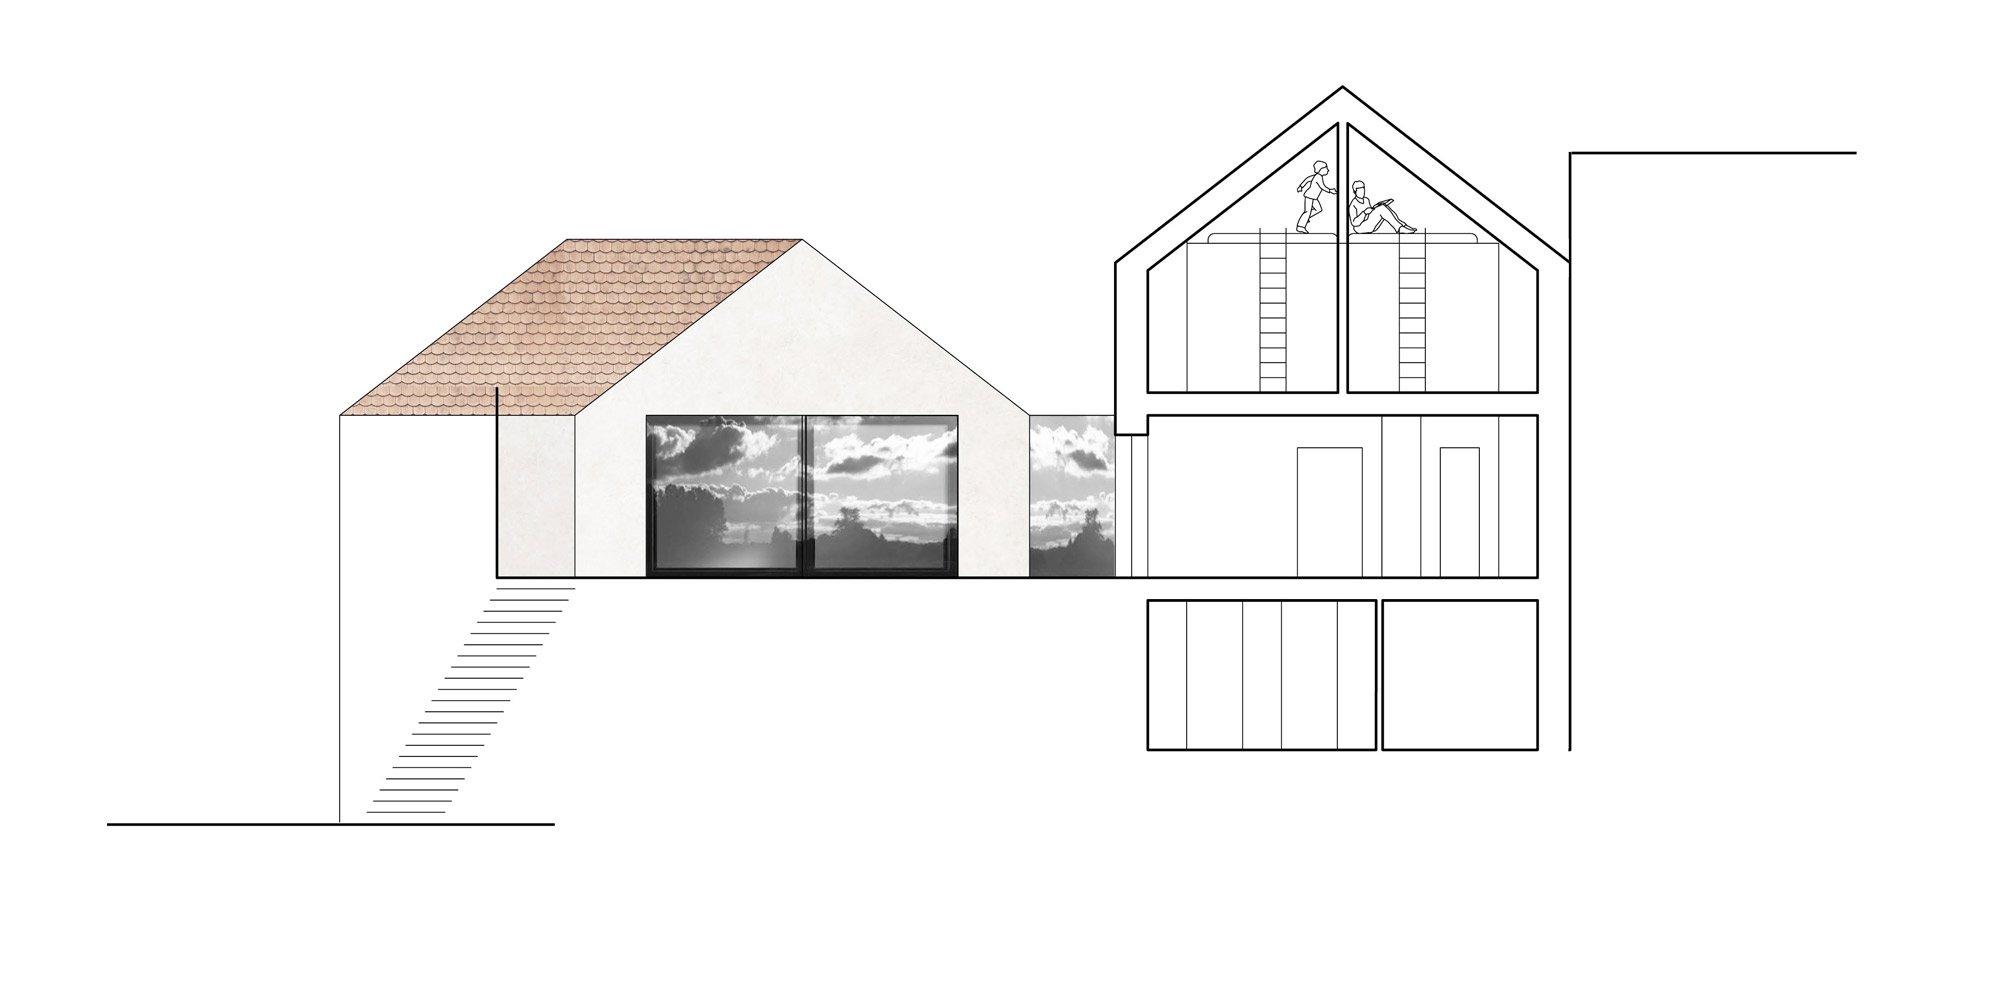 Sezione DD © Atelier 111 architekti